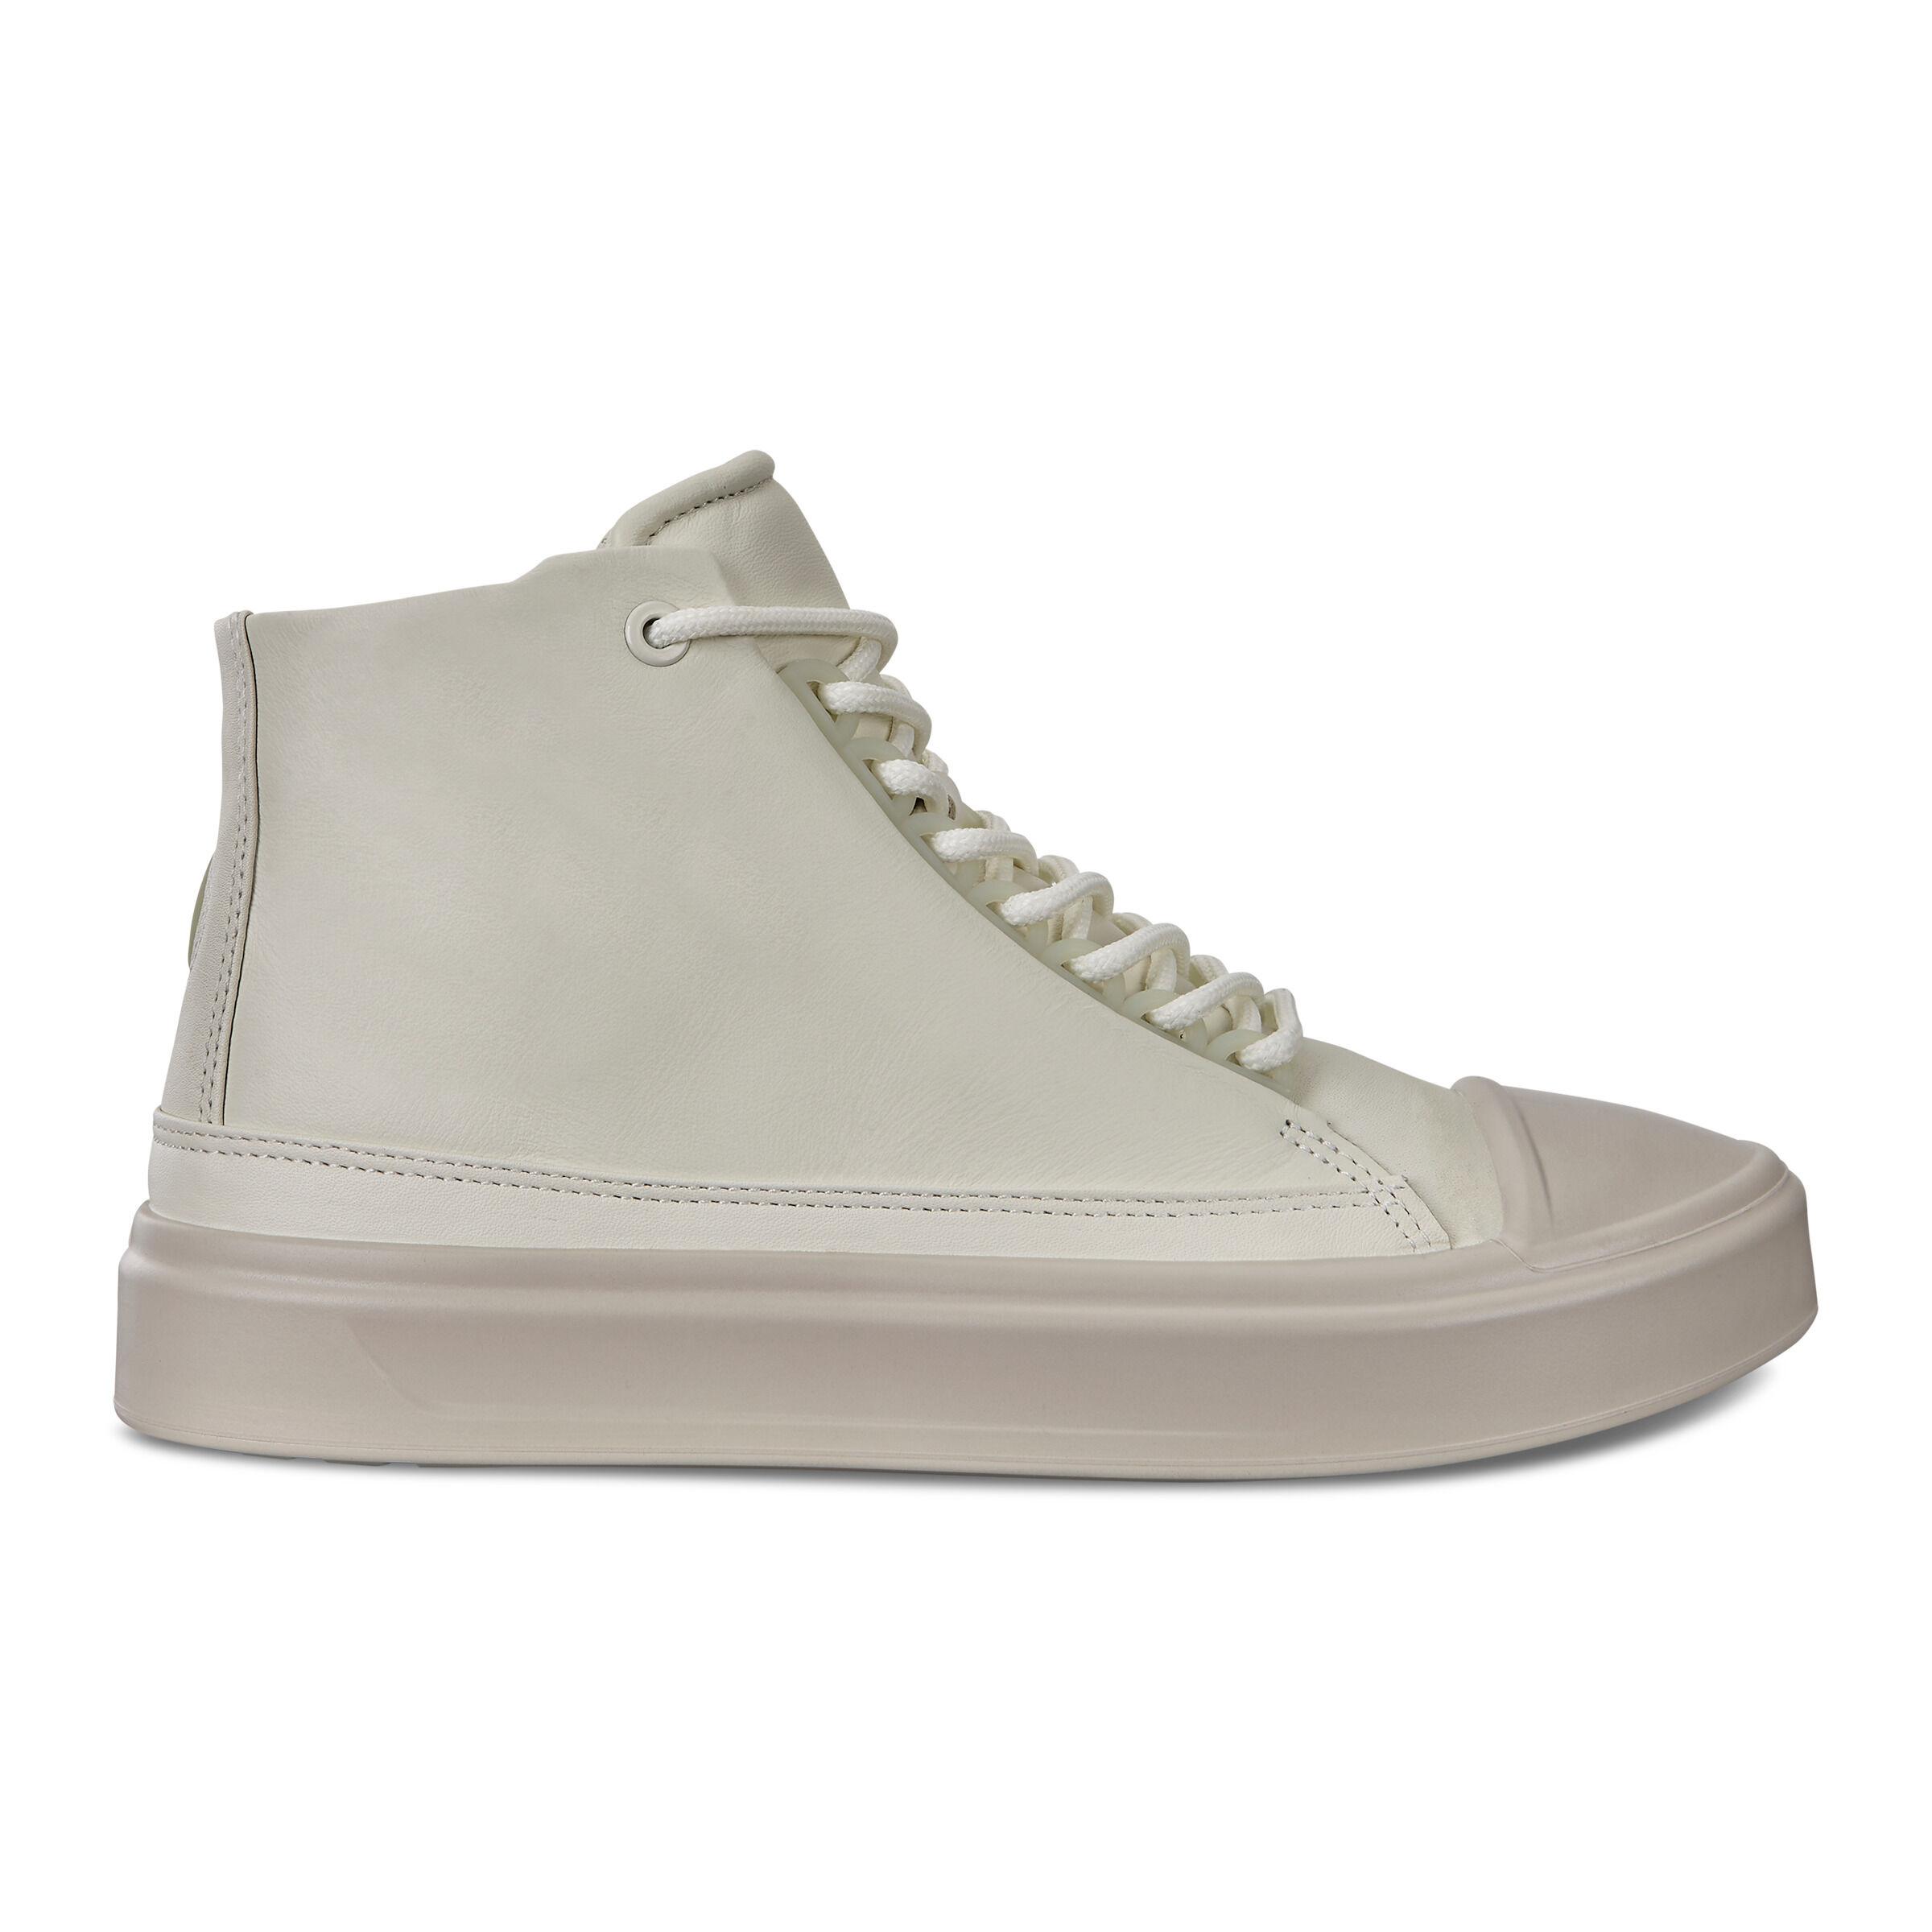 ECCO Flexure T cap Women's Sneaker   Women's high tops   ECCO® Shoes